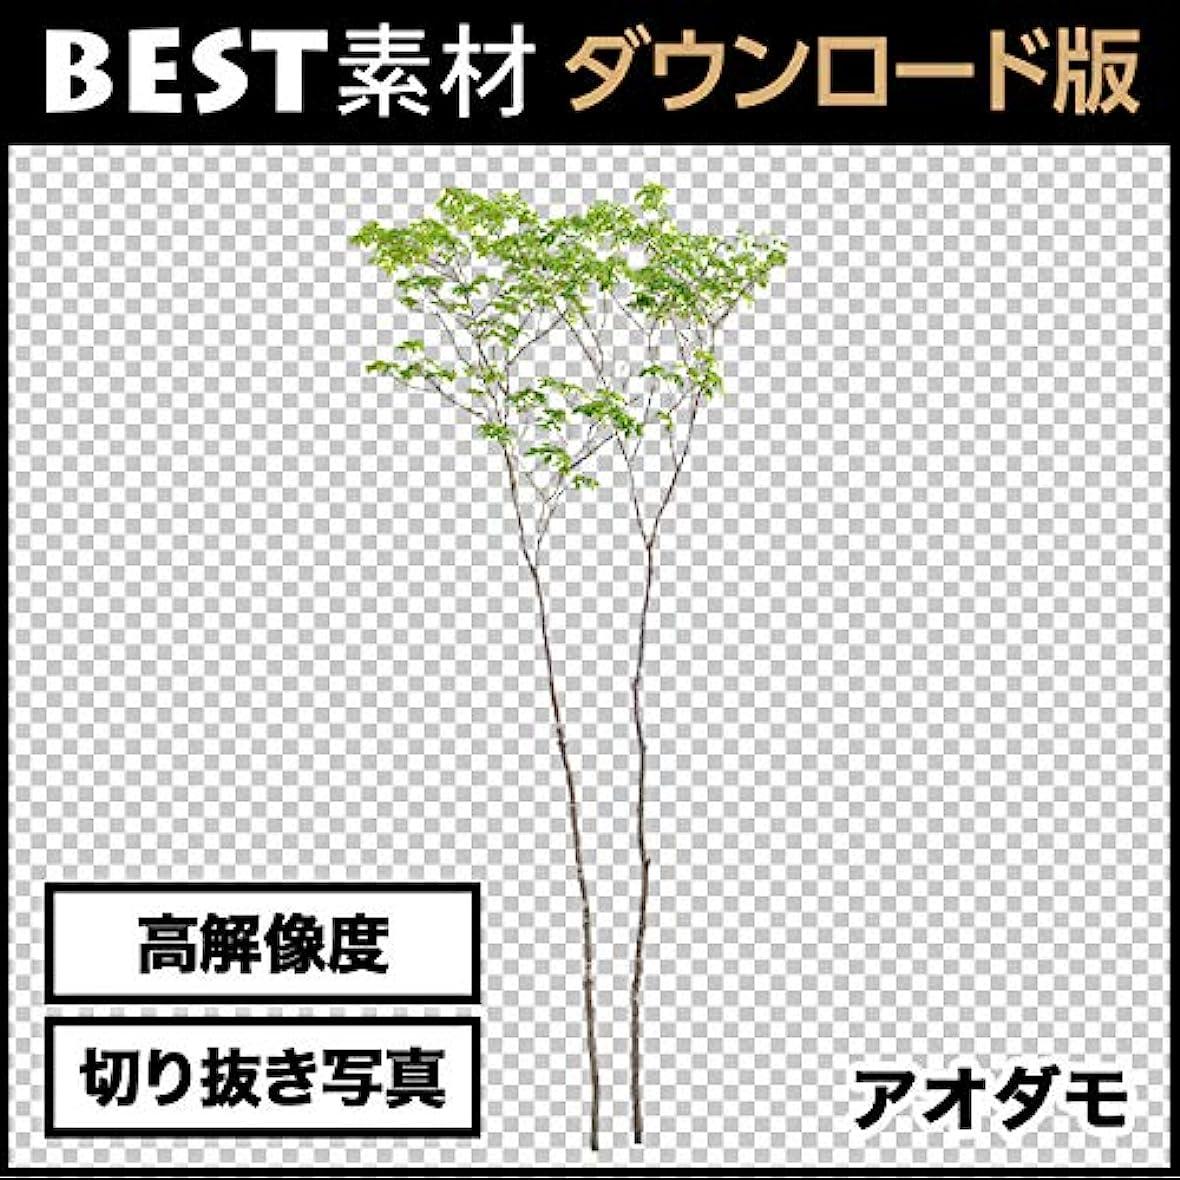 【BEST素材】高解像度の切り抜き写真_アオダモ02|ダウンロード版